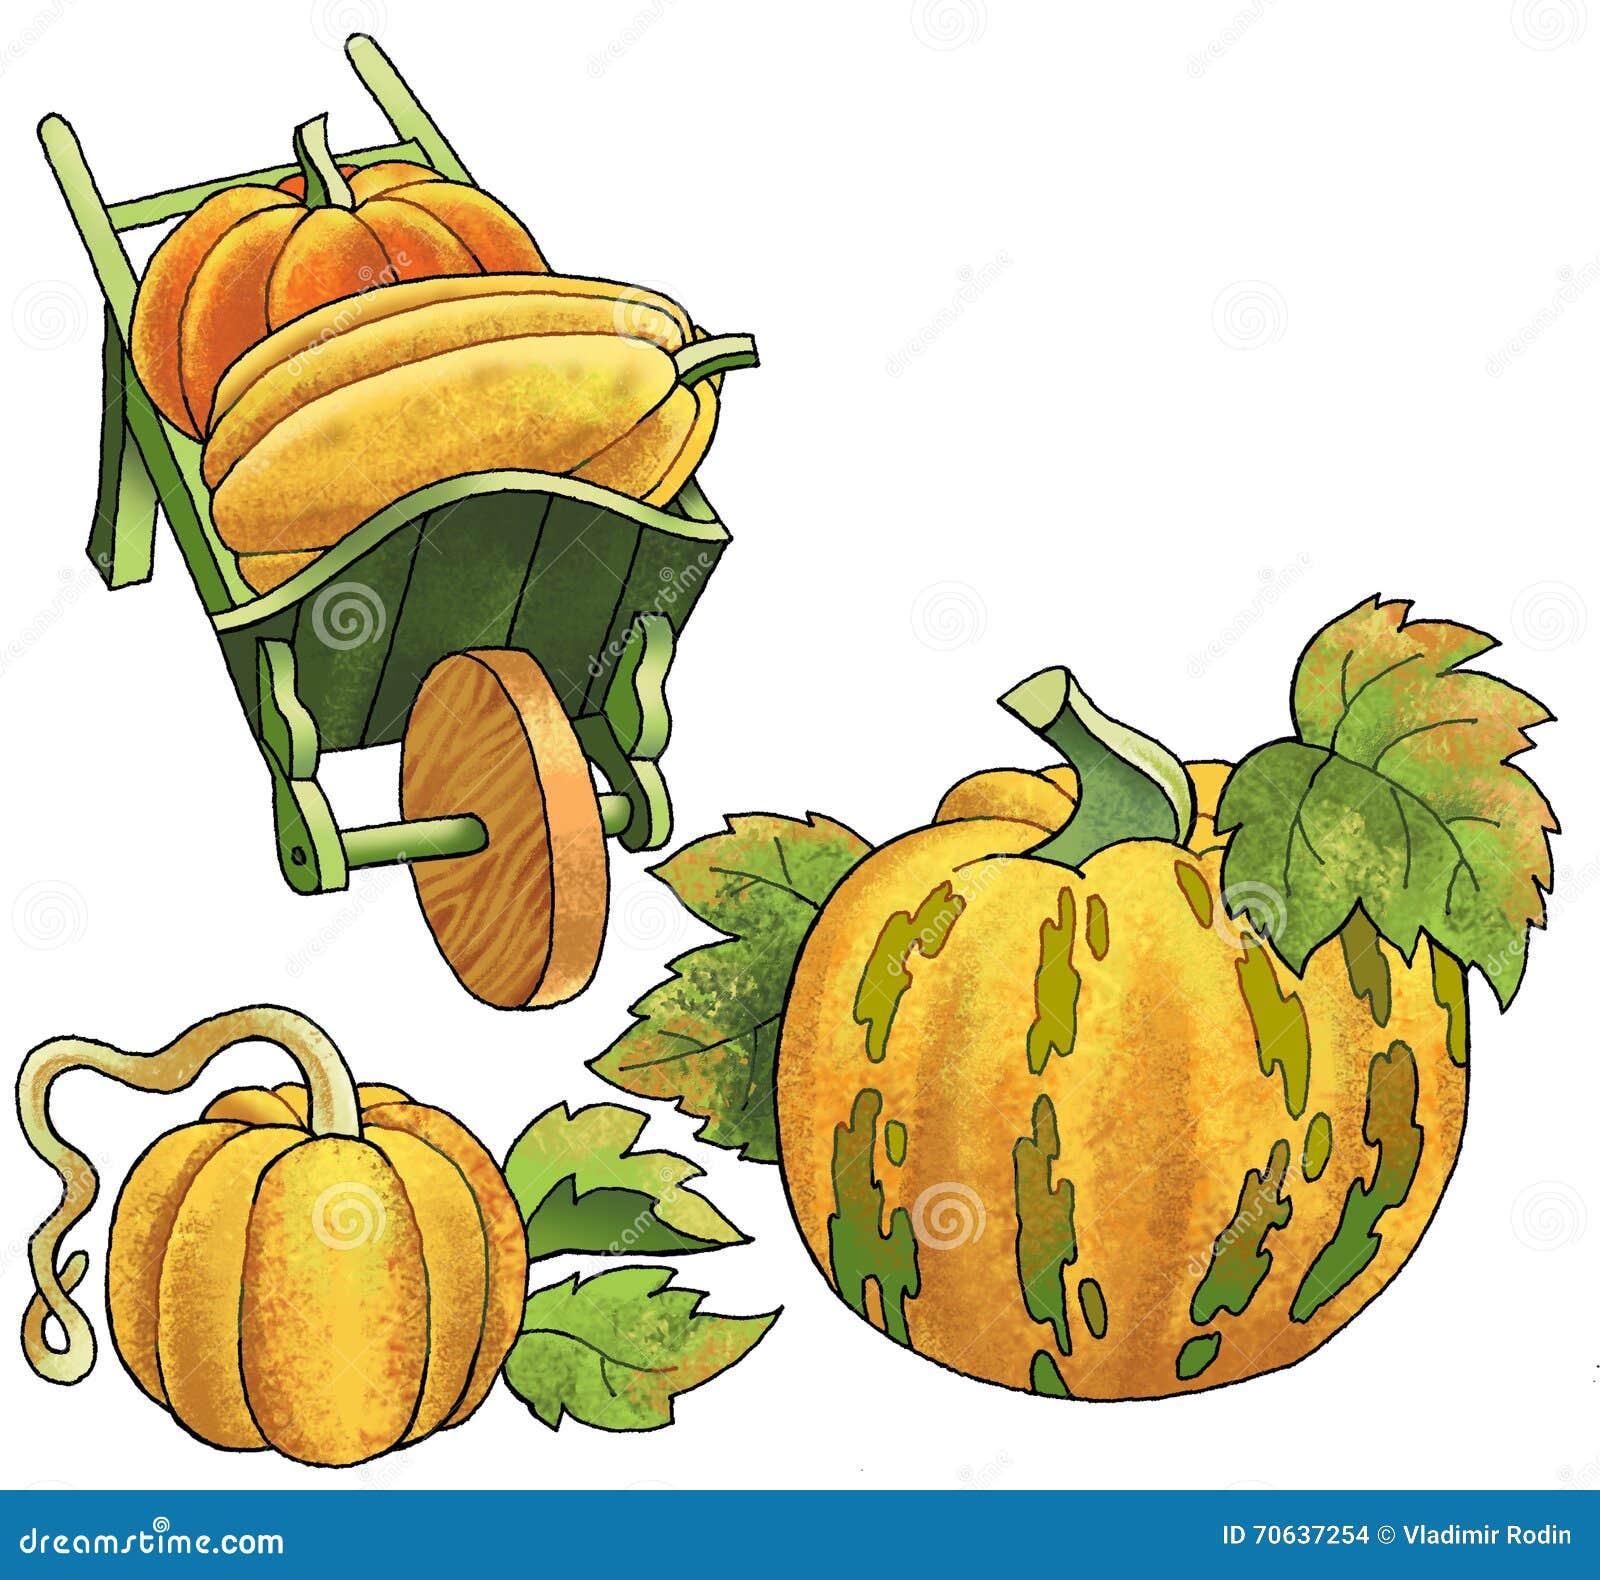 is a pumpkin a fruit or vegetable fruit market